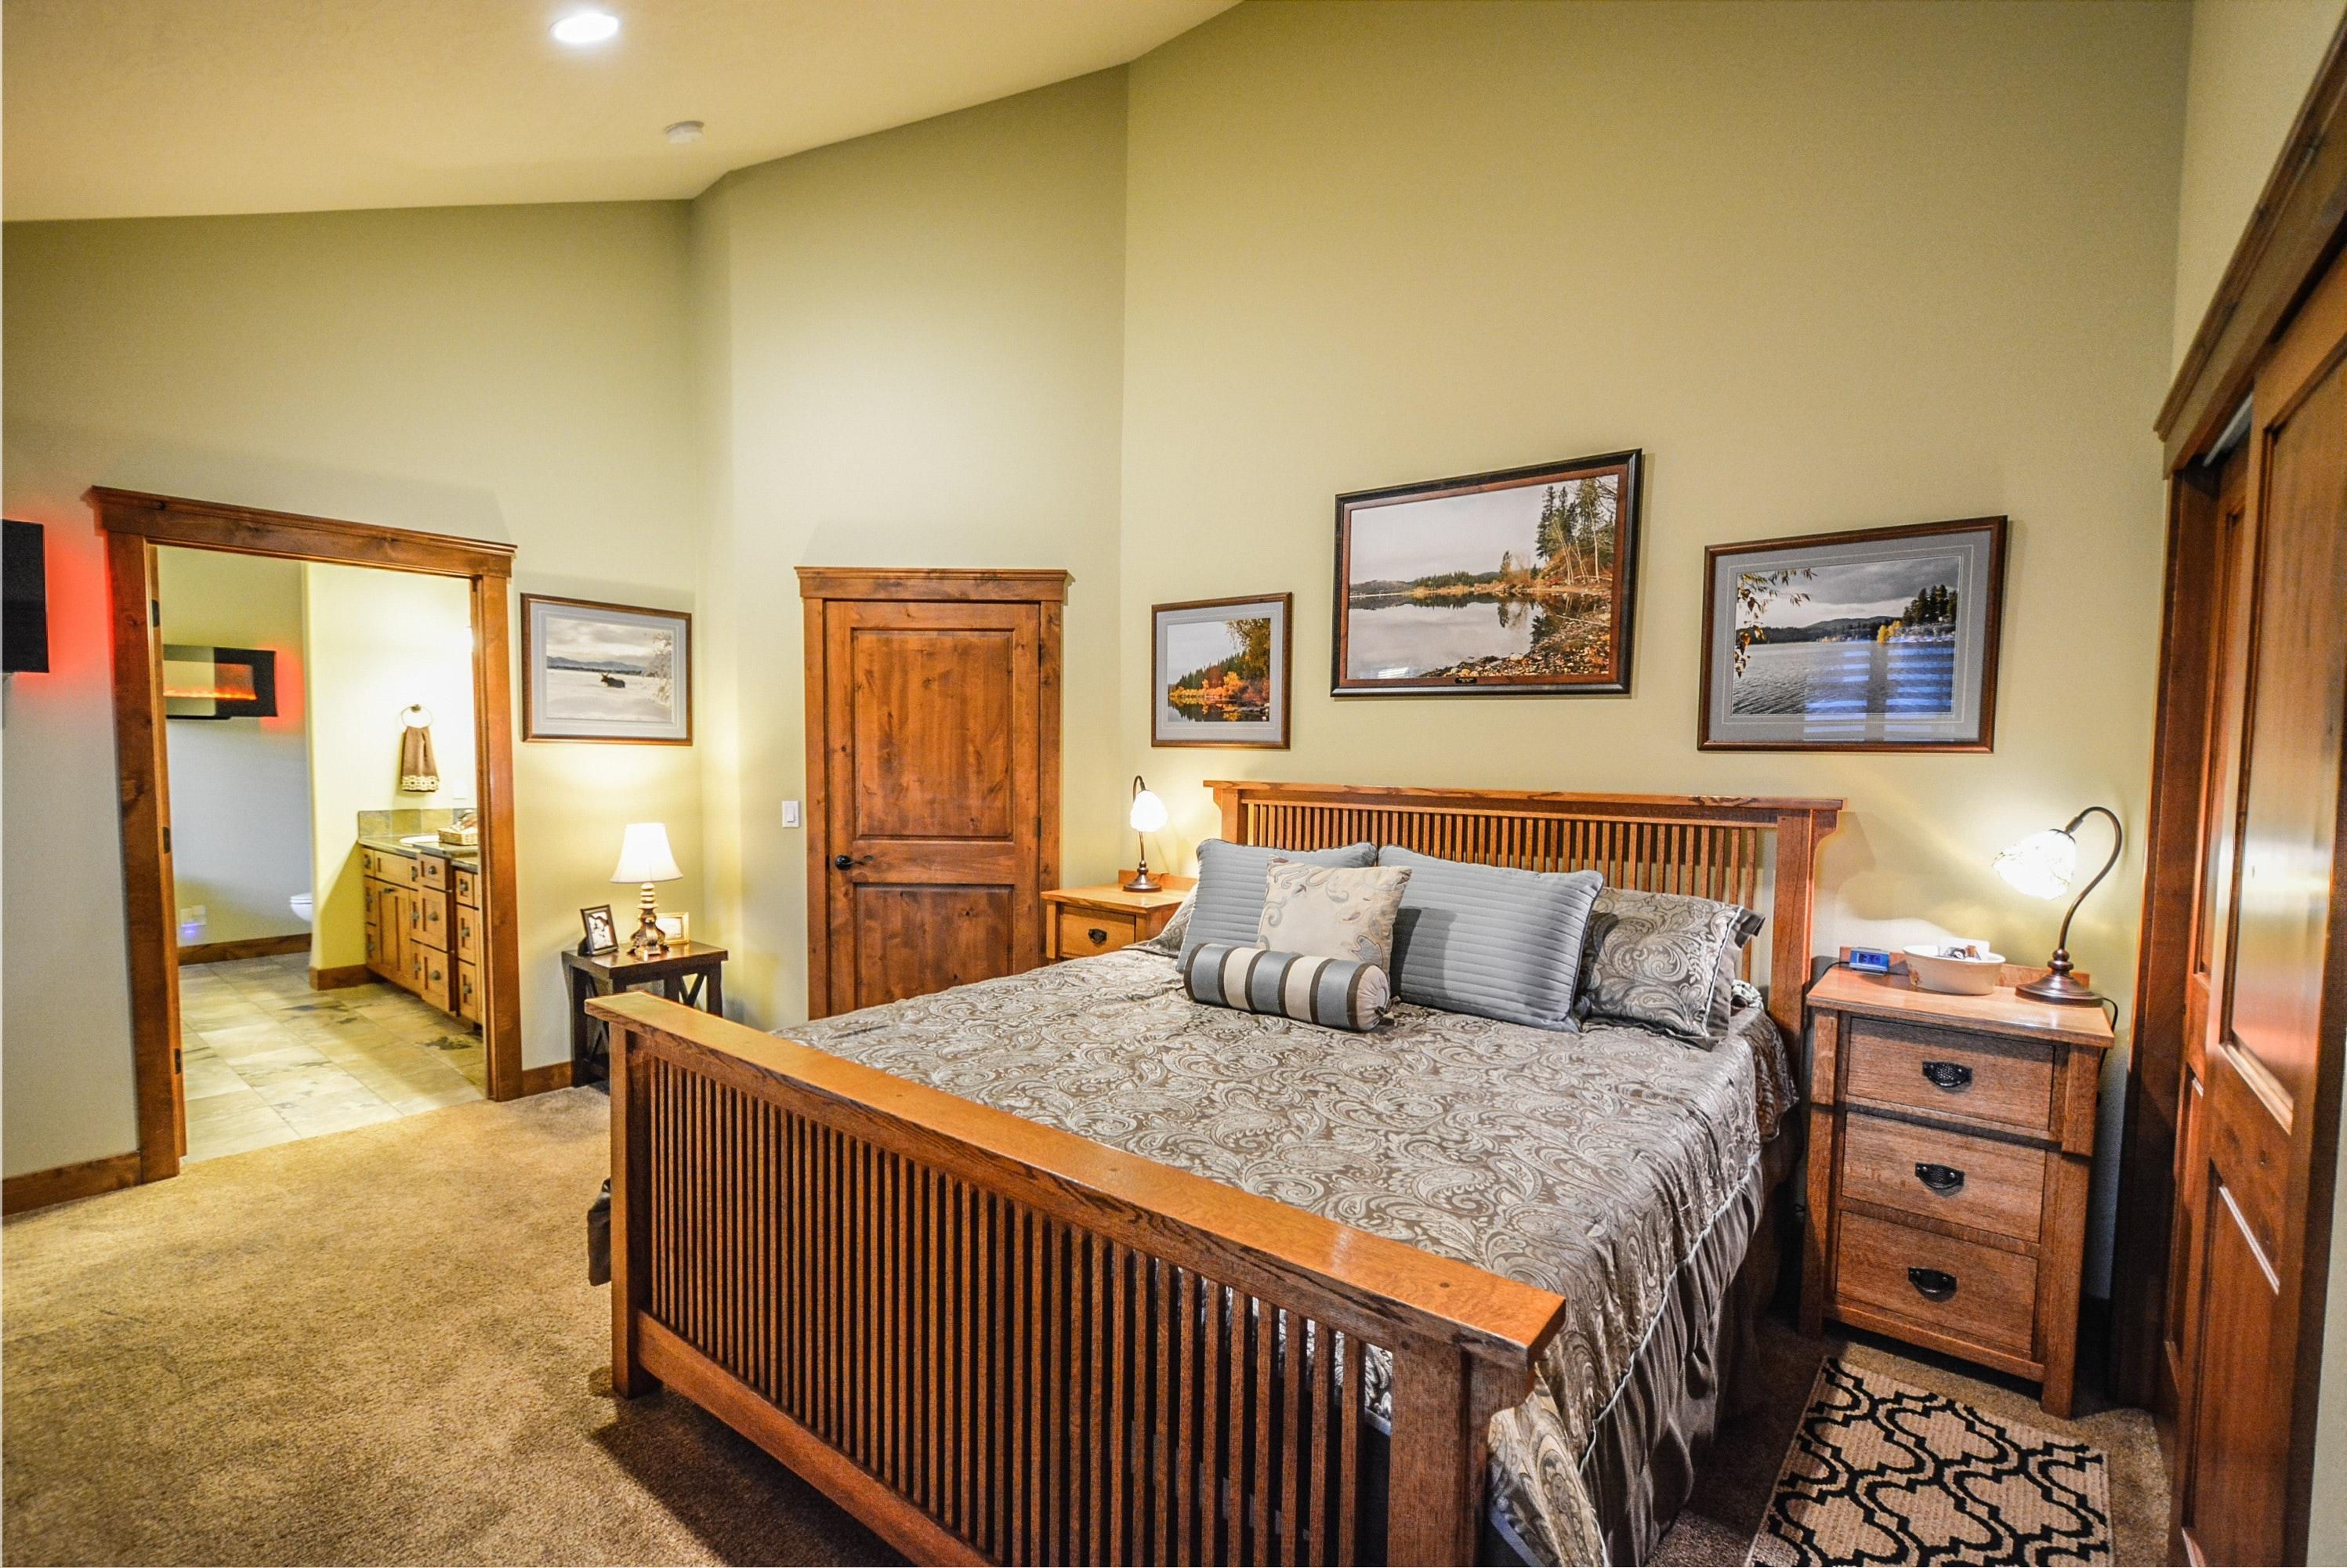 Small bedroom furnishing interior ideas